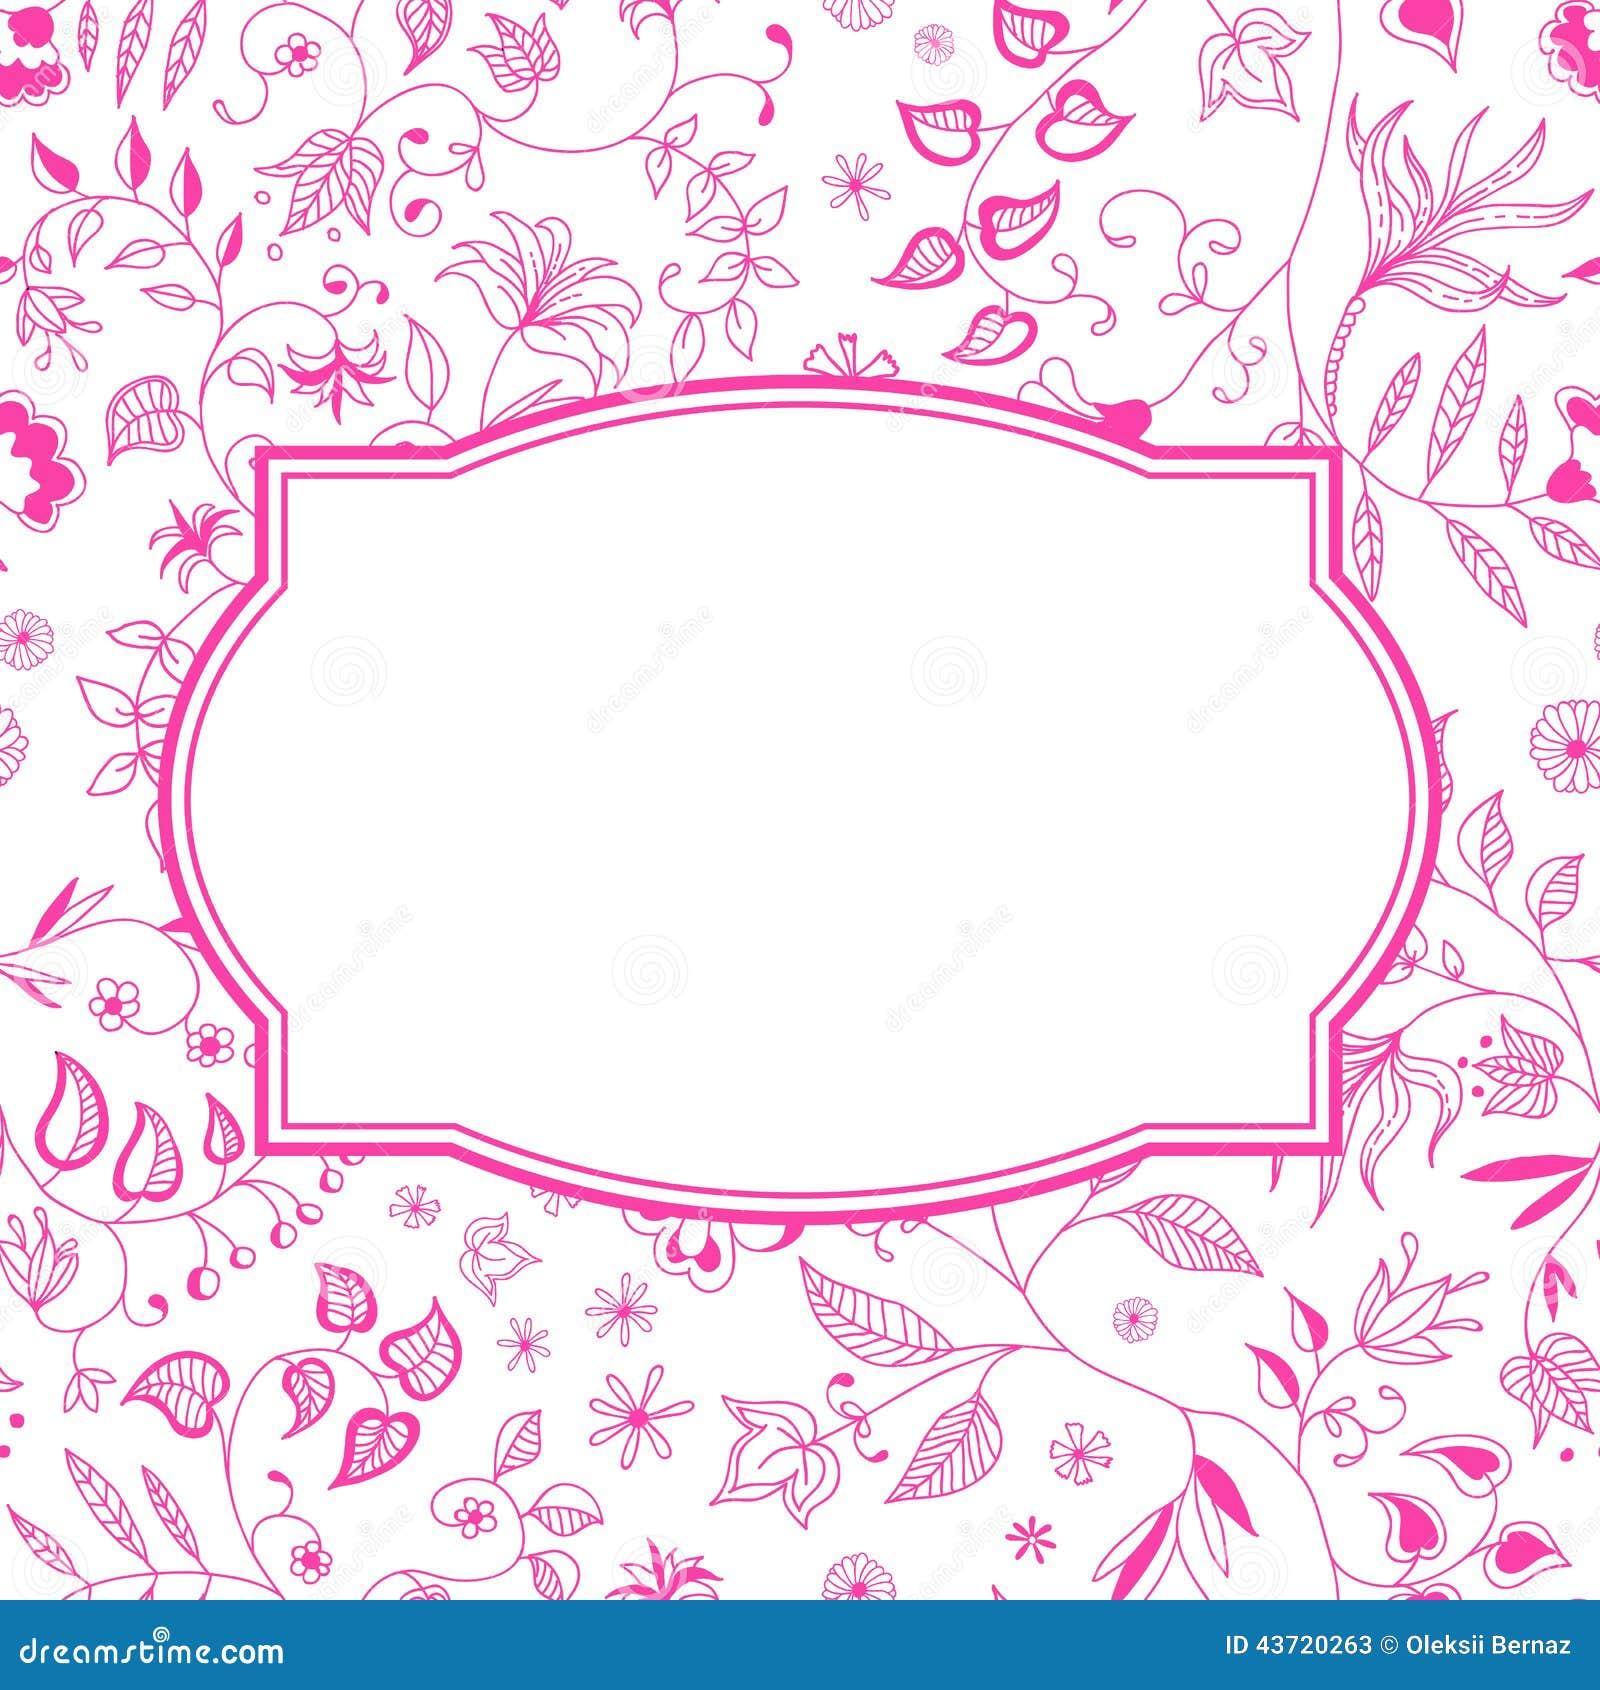 blumenmuster rosa hintergrund vektor abbildung bild 43720263. Black Bedroom Furniture Sets. Home Design Ideas